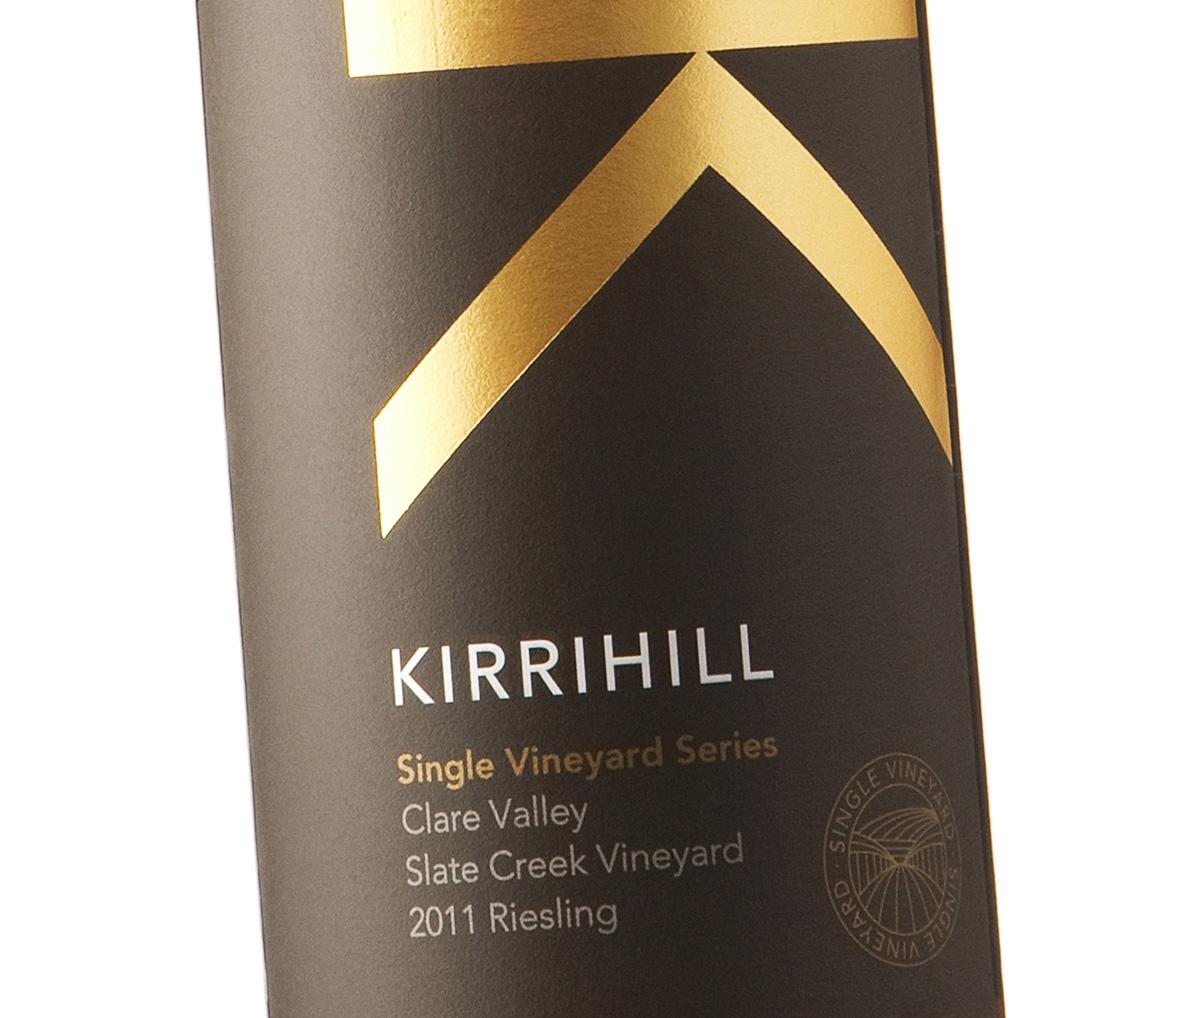 kirrihill-SV-label-1200